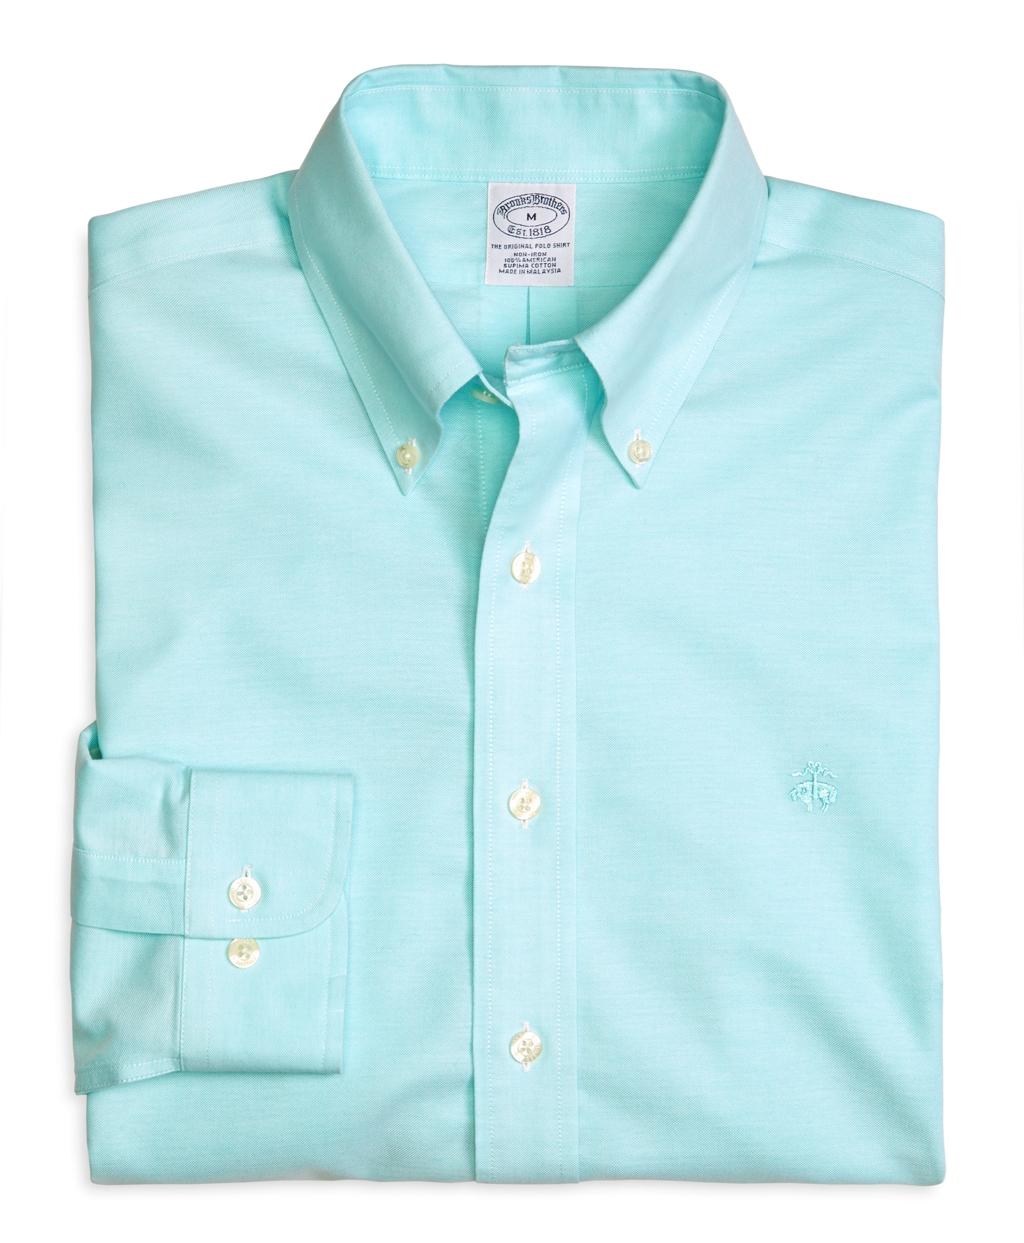 Lyst brooks brothers supima cotton slim fit noniron for Supima cotton dress shirts